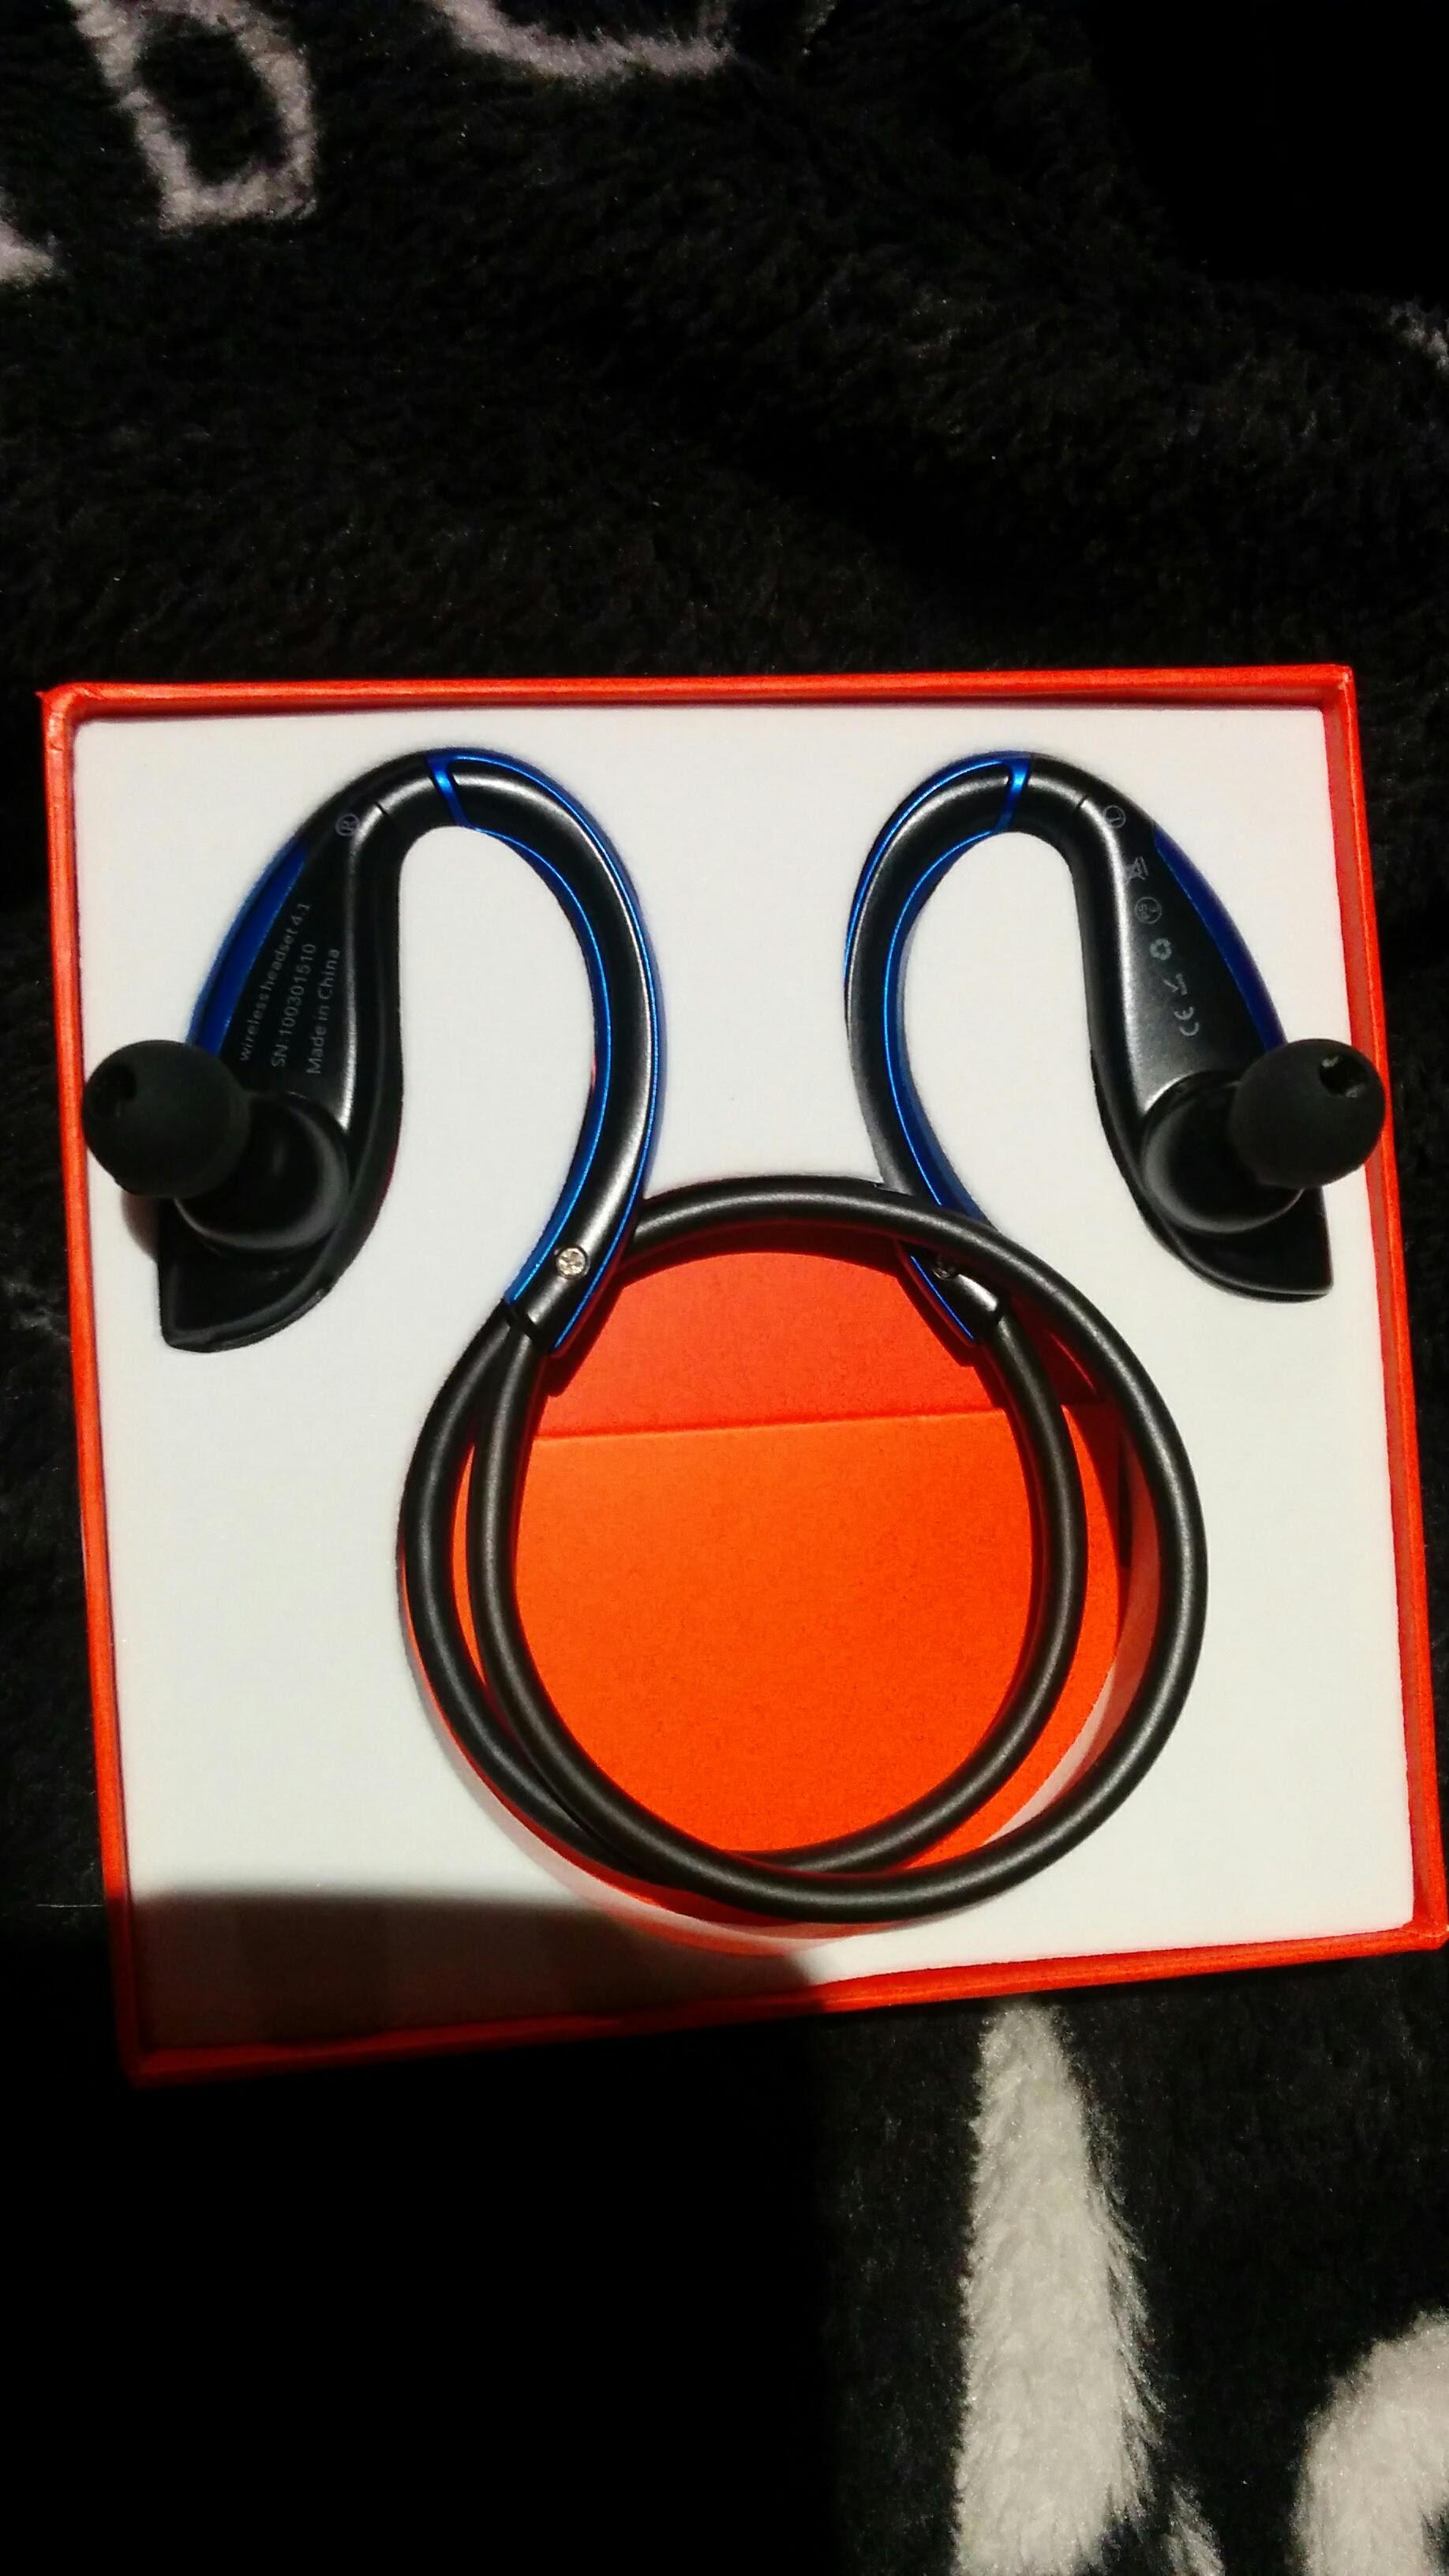 Yuwiss Bluetooth Wireless V4.1 Headphones